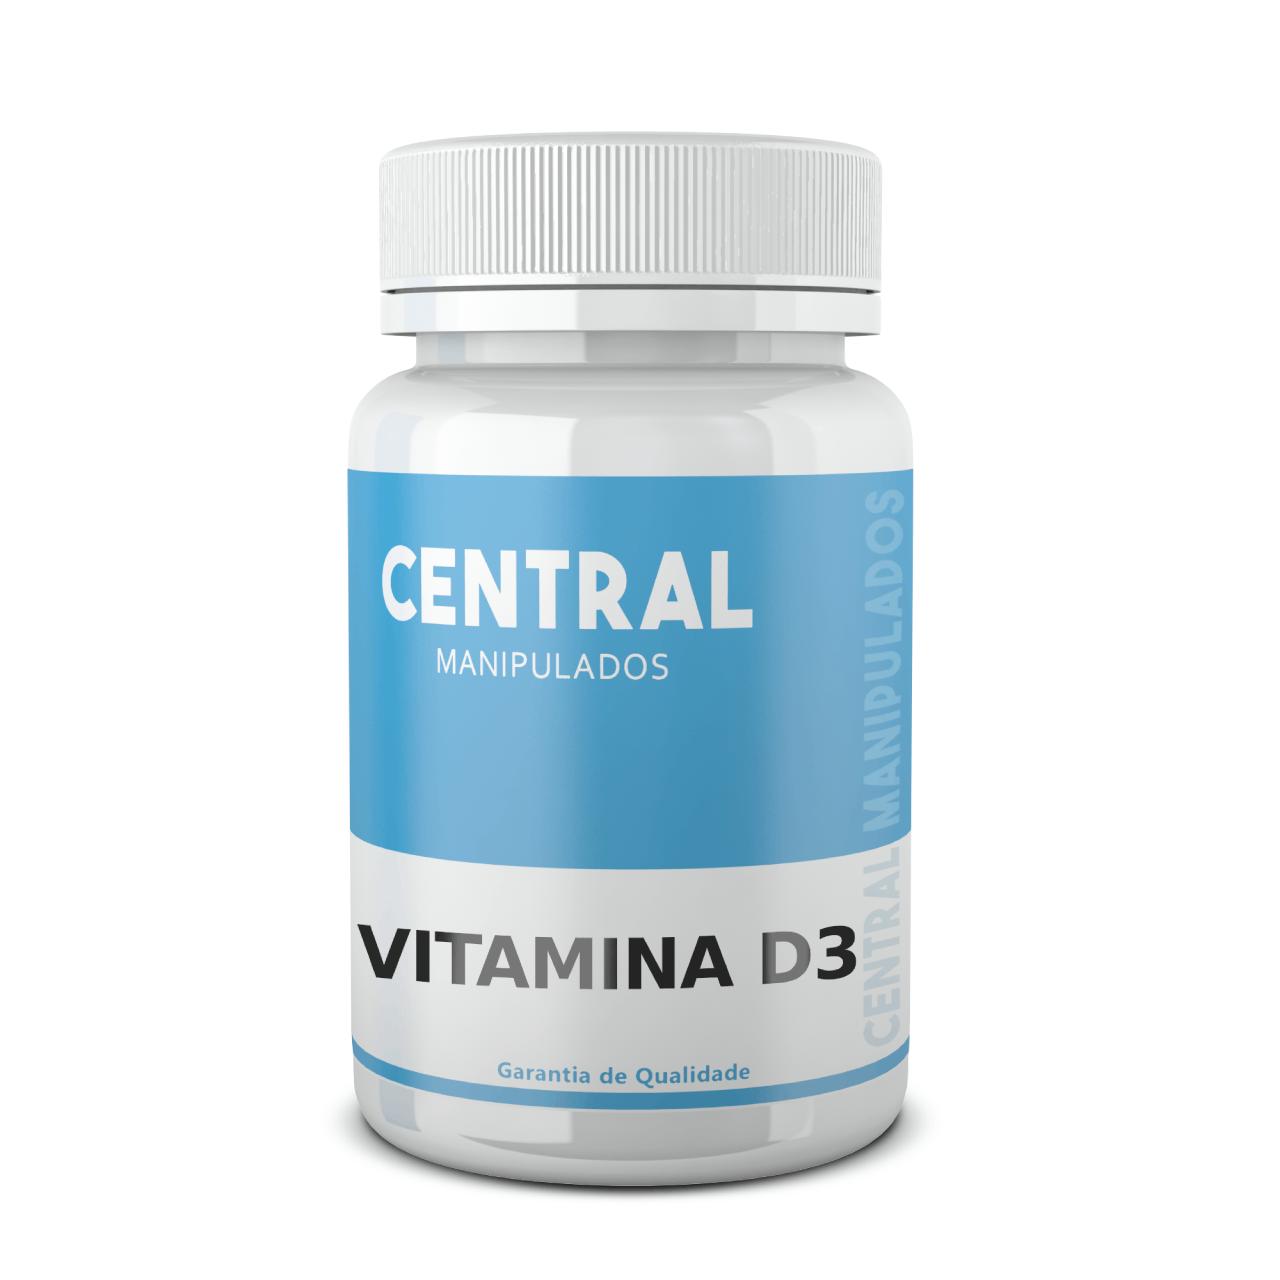 Vitamina D3 10.000 UI - 60 cápsulas - Saúde Óssea e Muscular